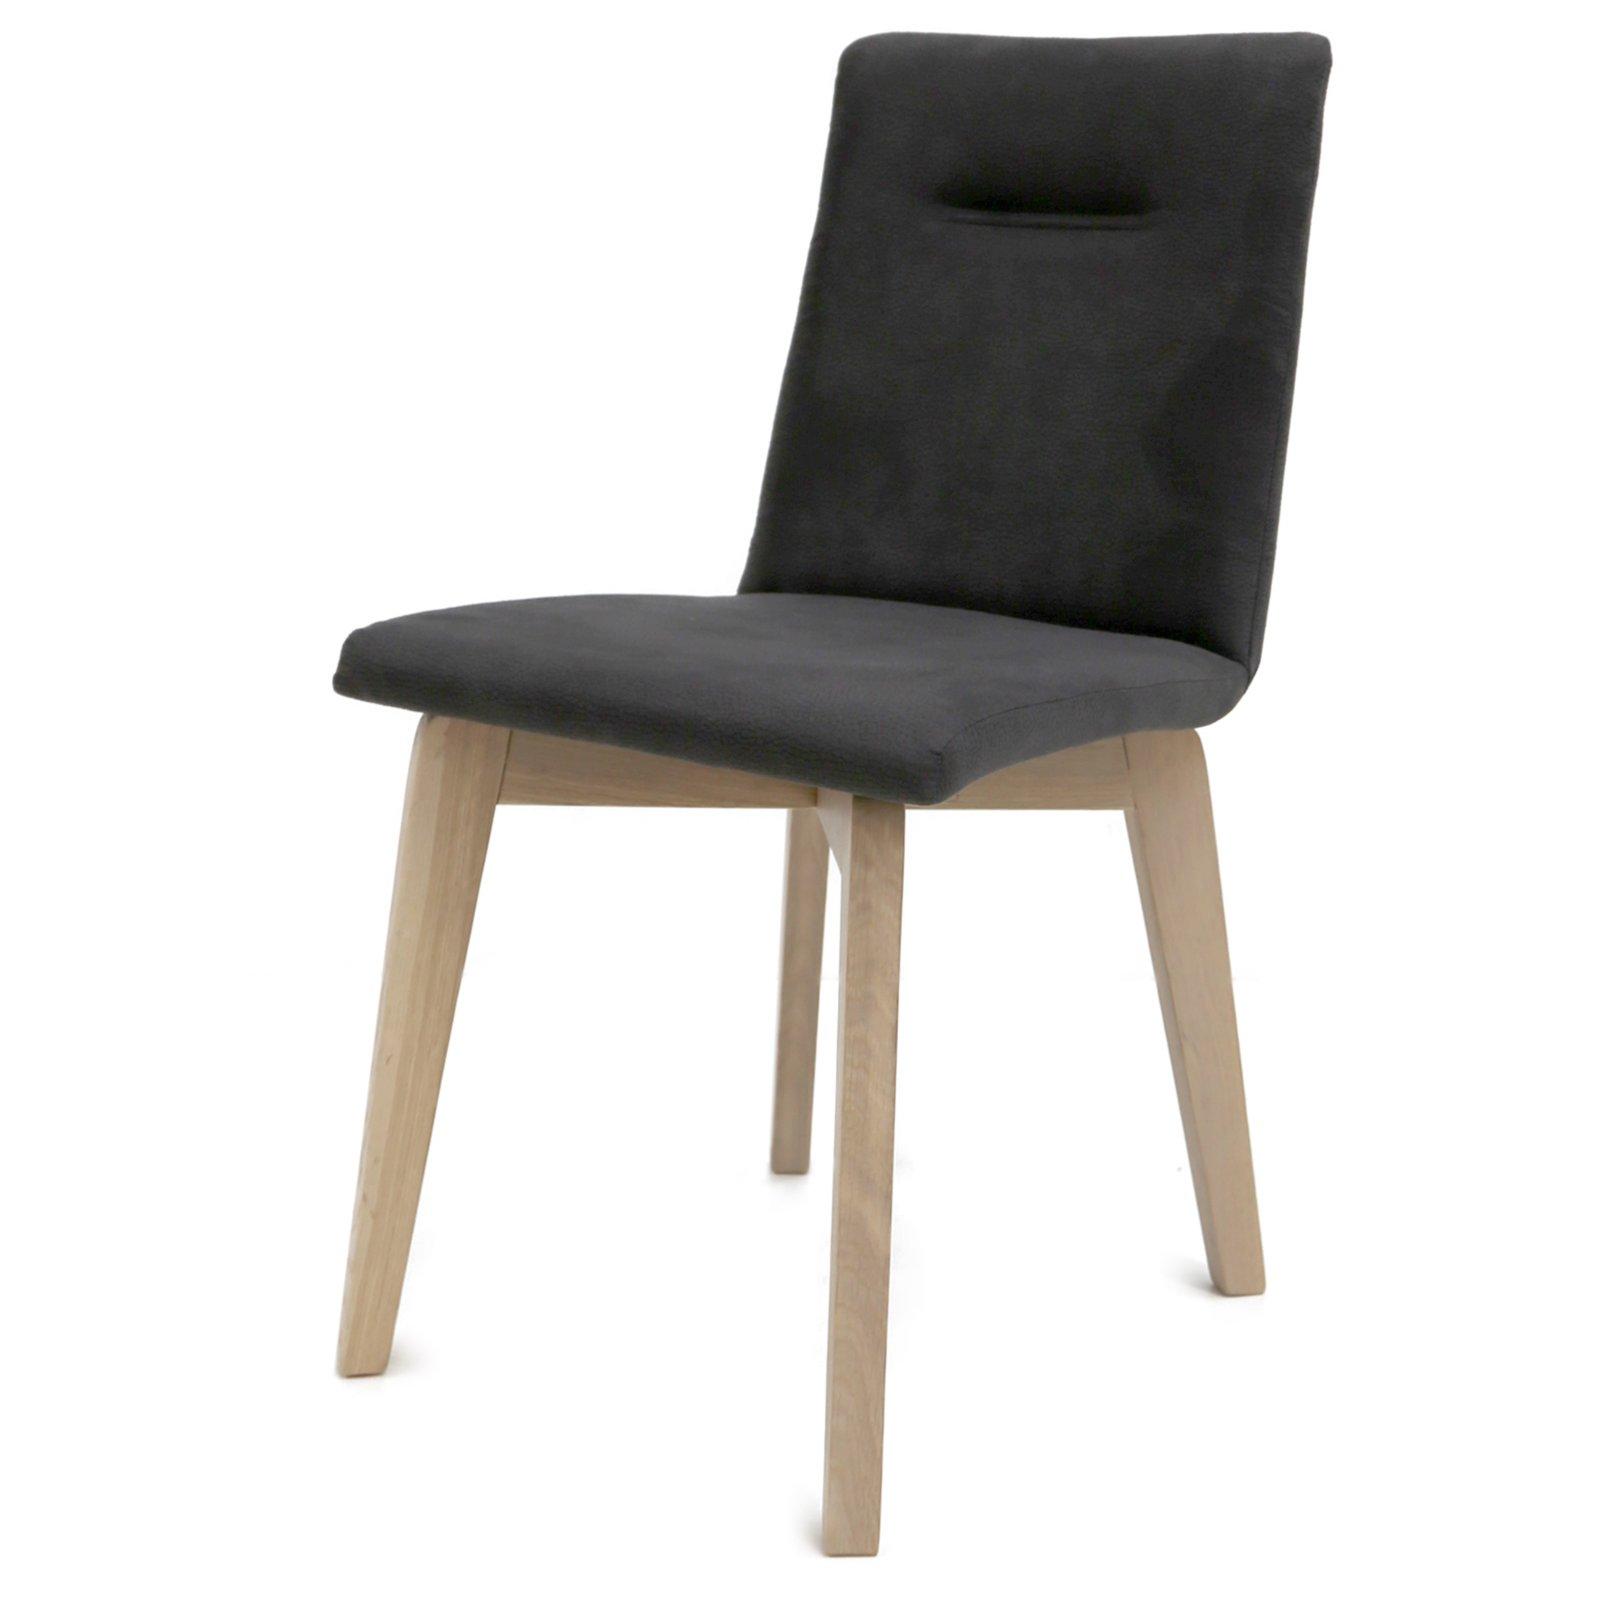 polsterstuhl rom anthrazit eiche bianco massiv. Black Bedroom Furniture Sets. Home Design Ideas